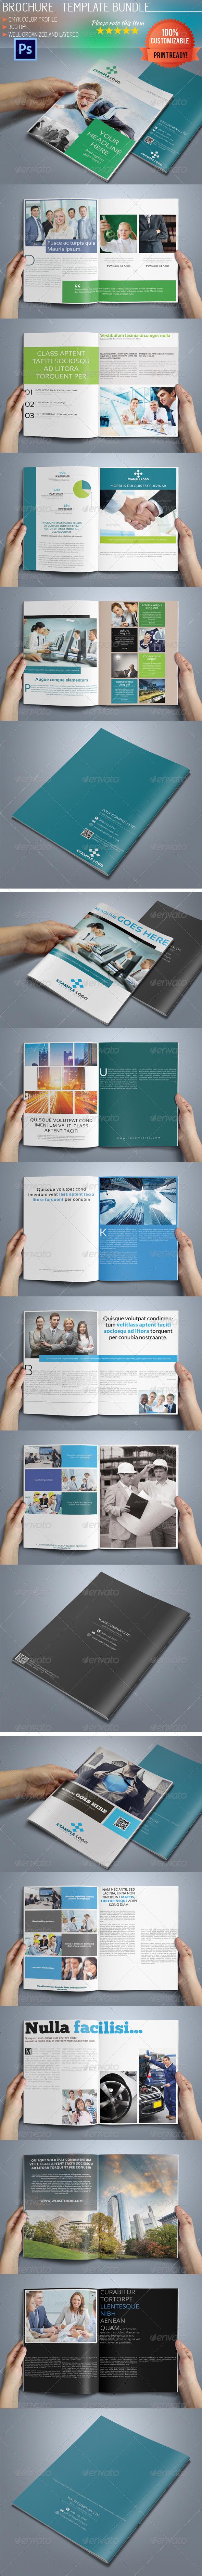 10 Pages Business Brochure Bundle - Corporate Brochures